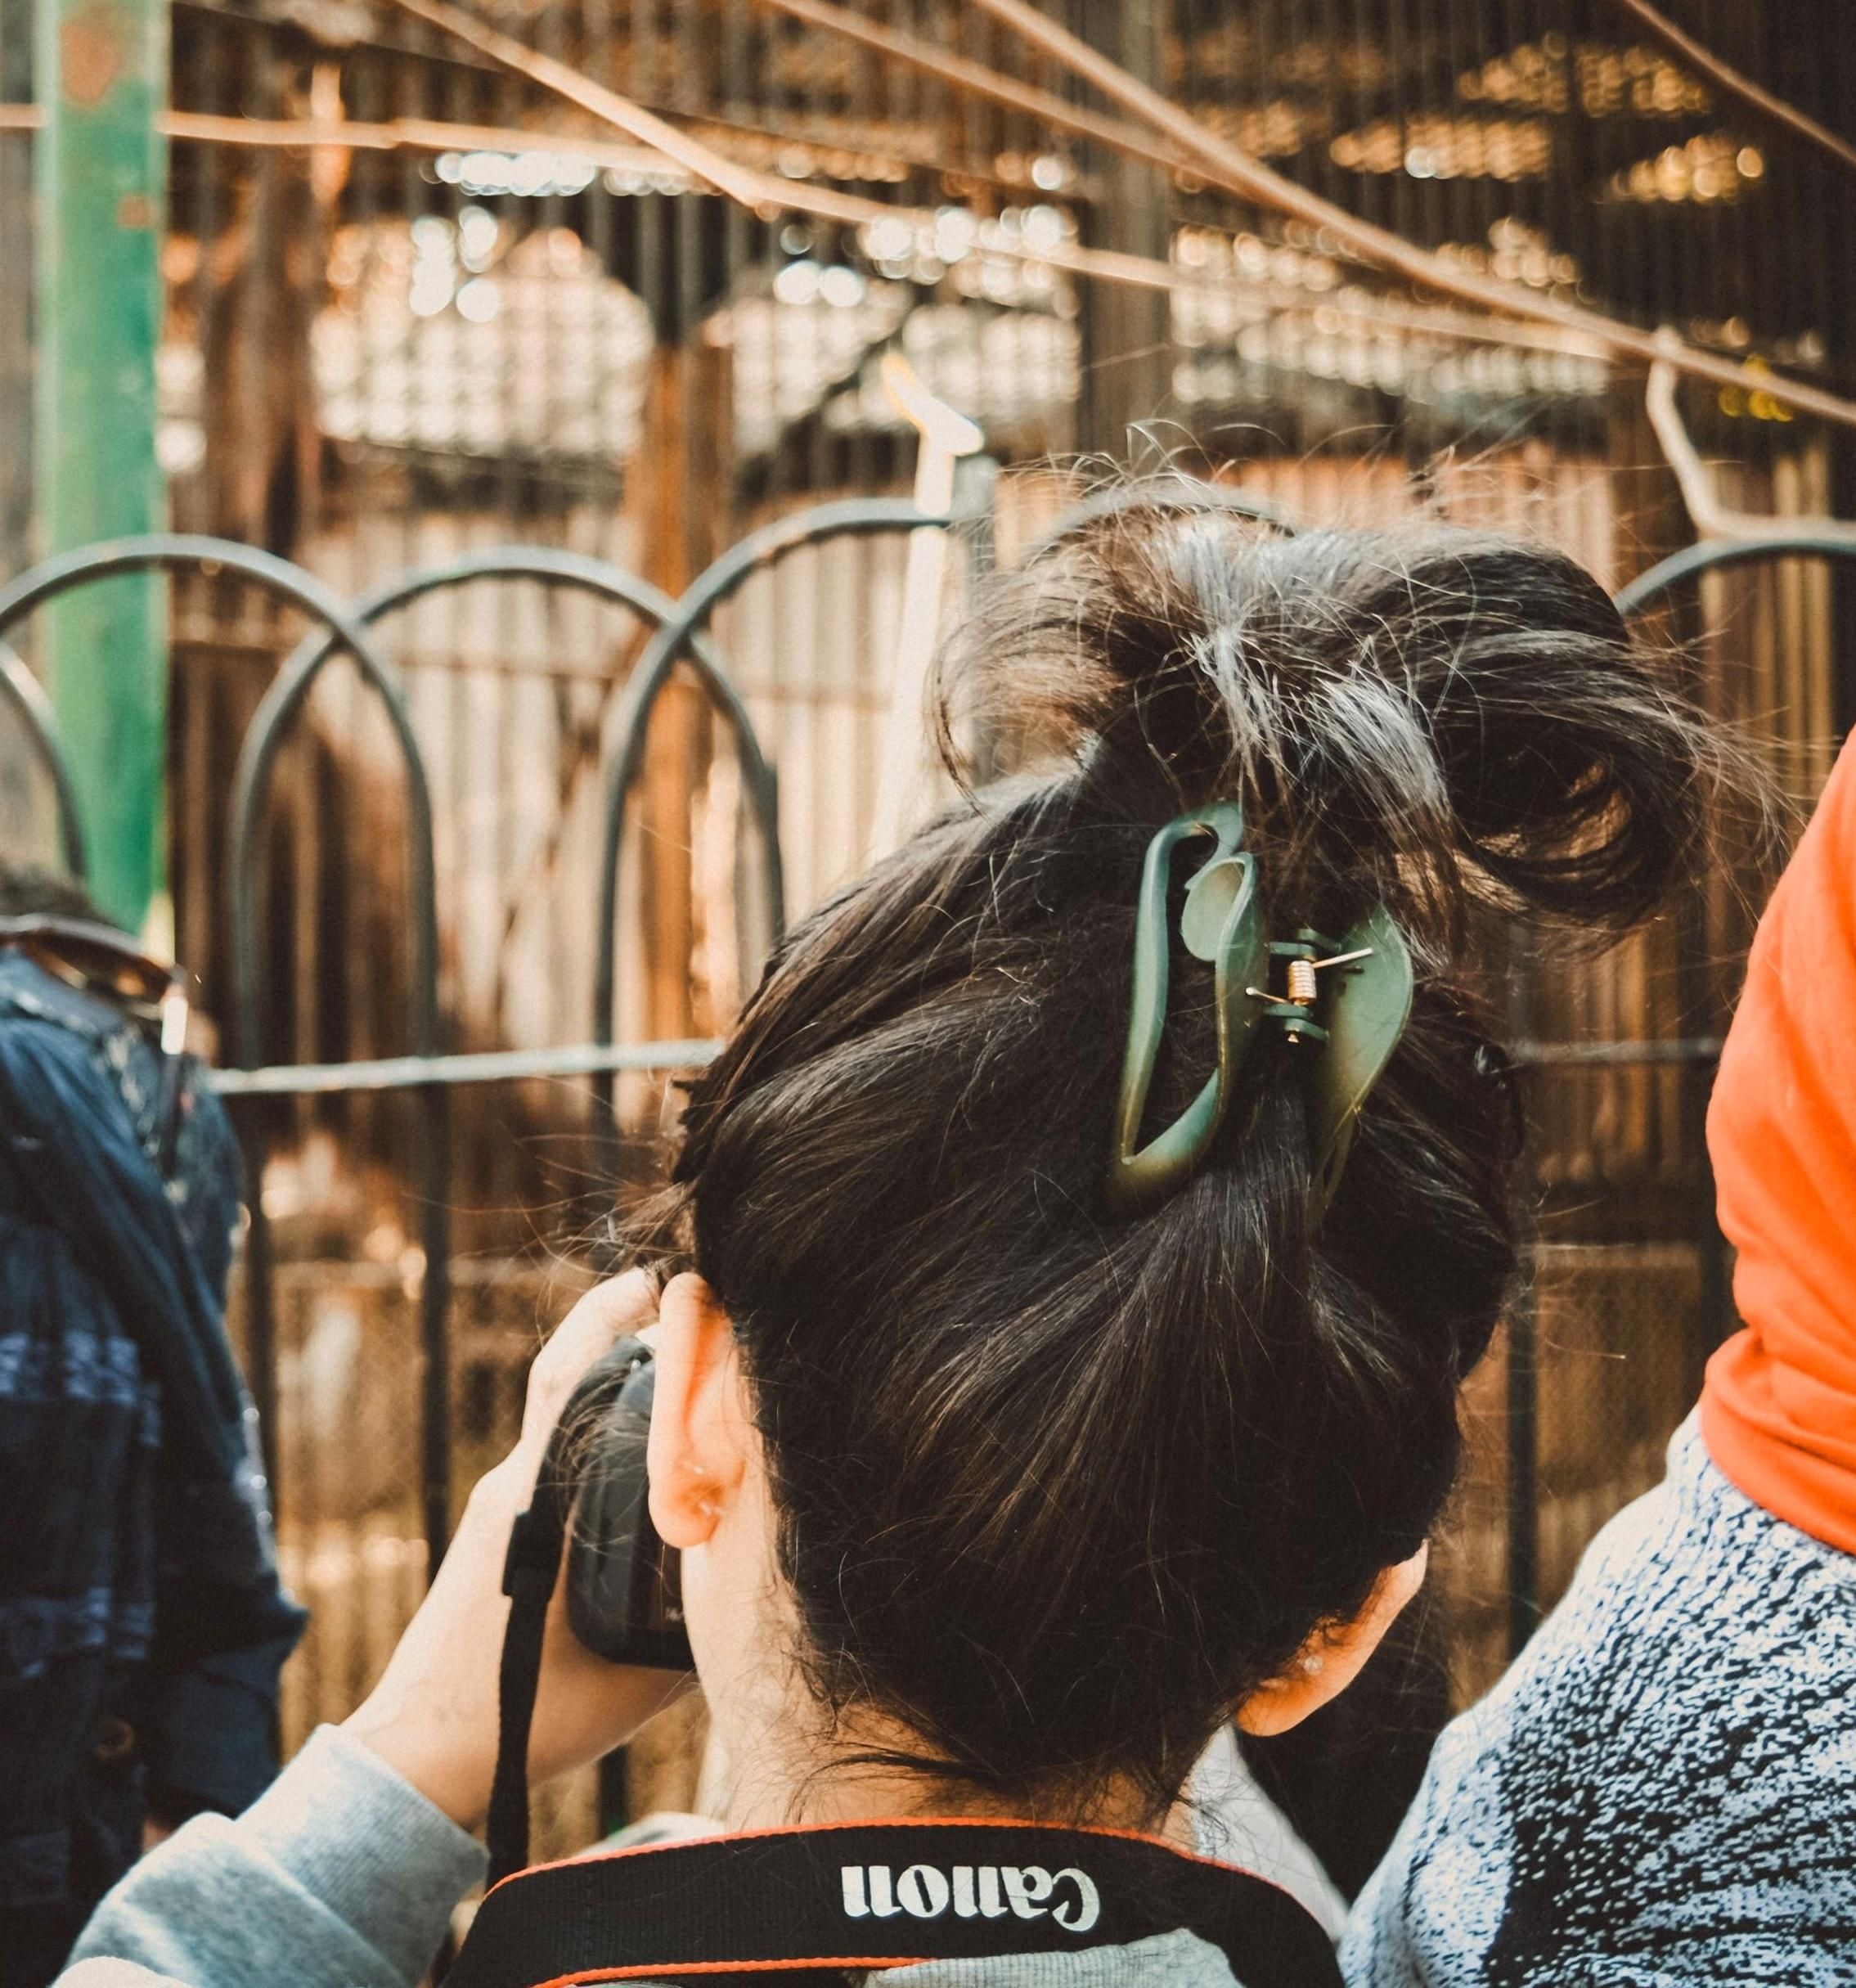 Hair Nails And Skin5782019021208245663 Highlight Kit On Black Hair Hair Ribbon Ideas Hair Salons Near Me That In 2020 Sew In Hair Extensions Diy Hair Dye Eco Hair